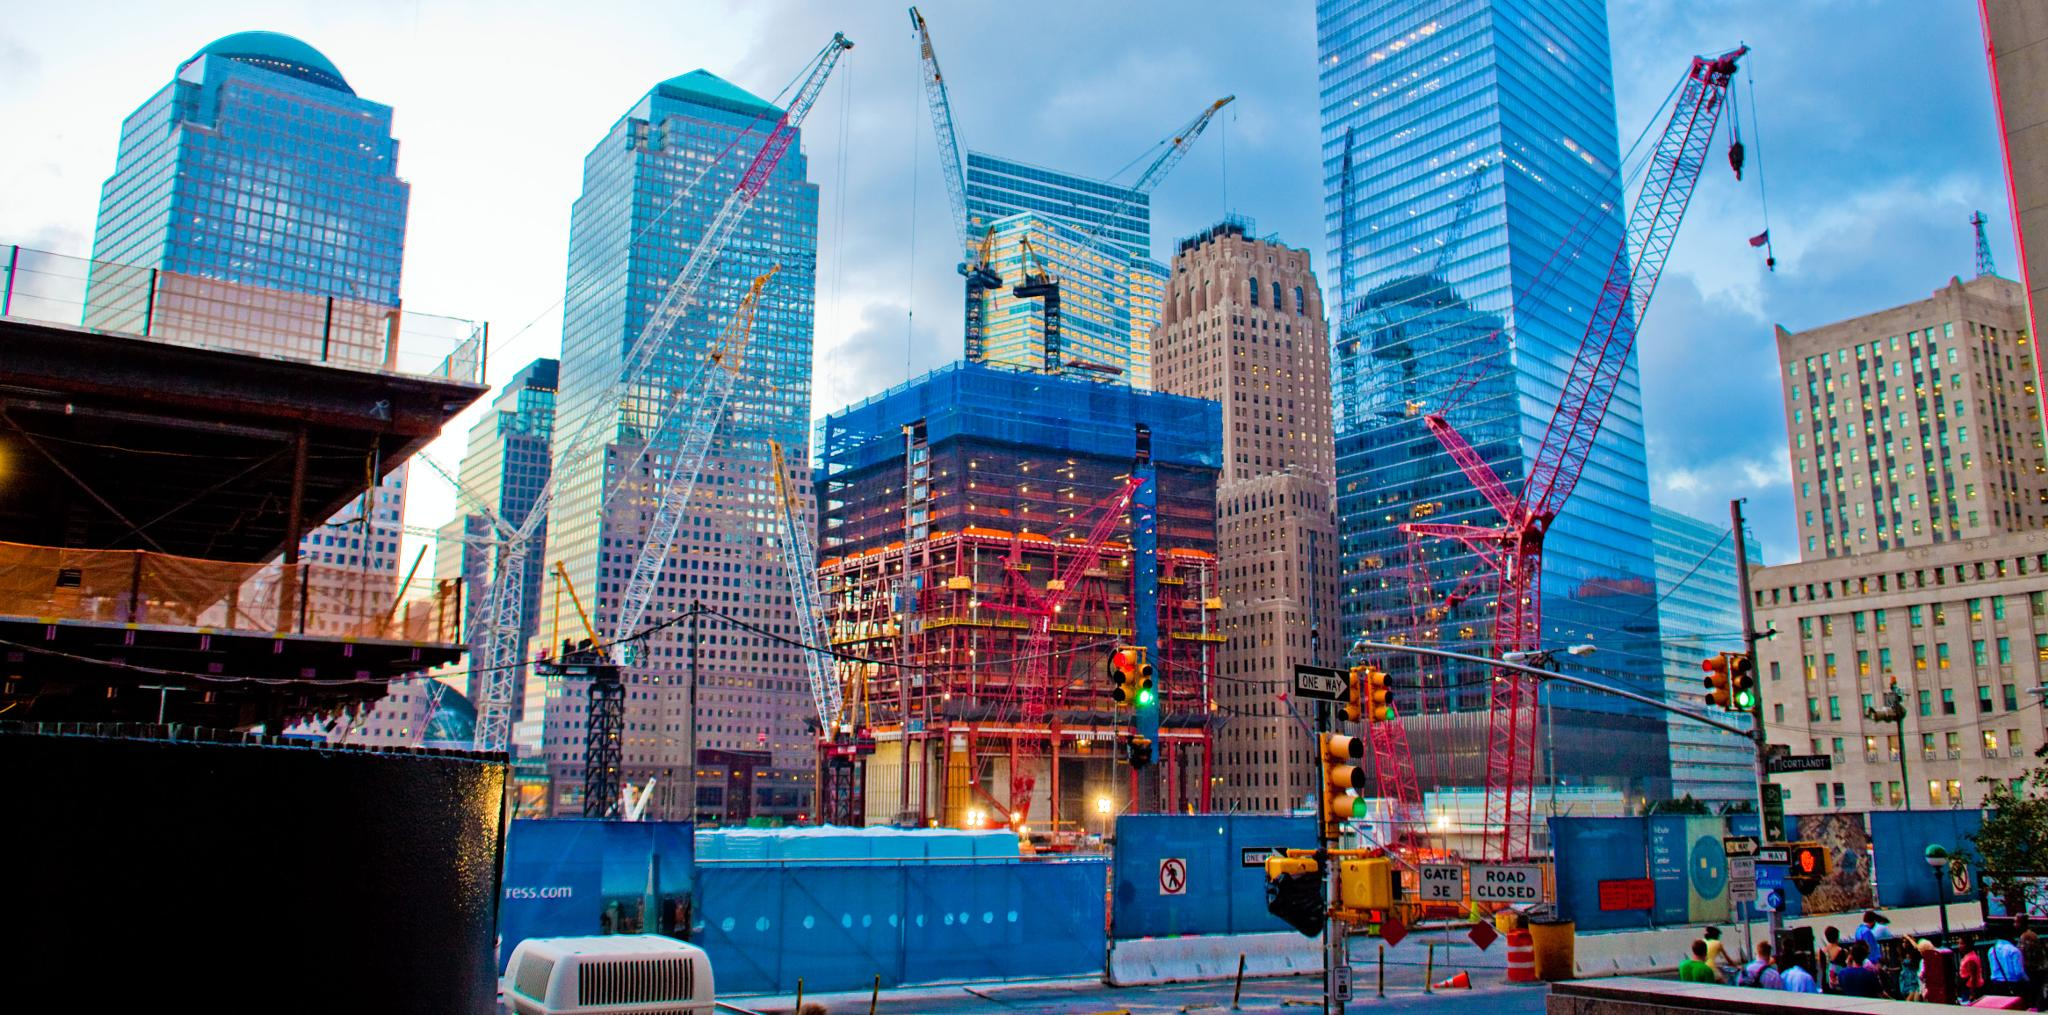 Always remember - Rebuild - Construction by Jarl-Erik Sandberg